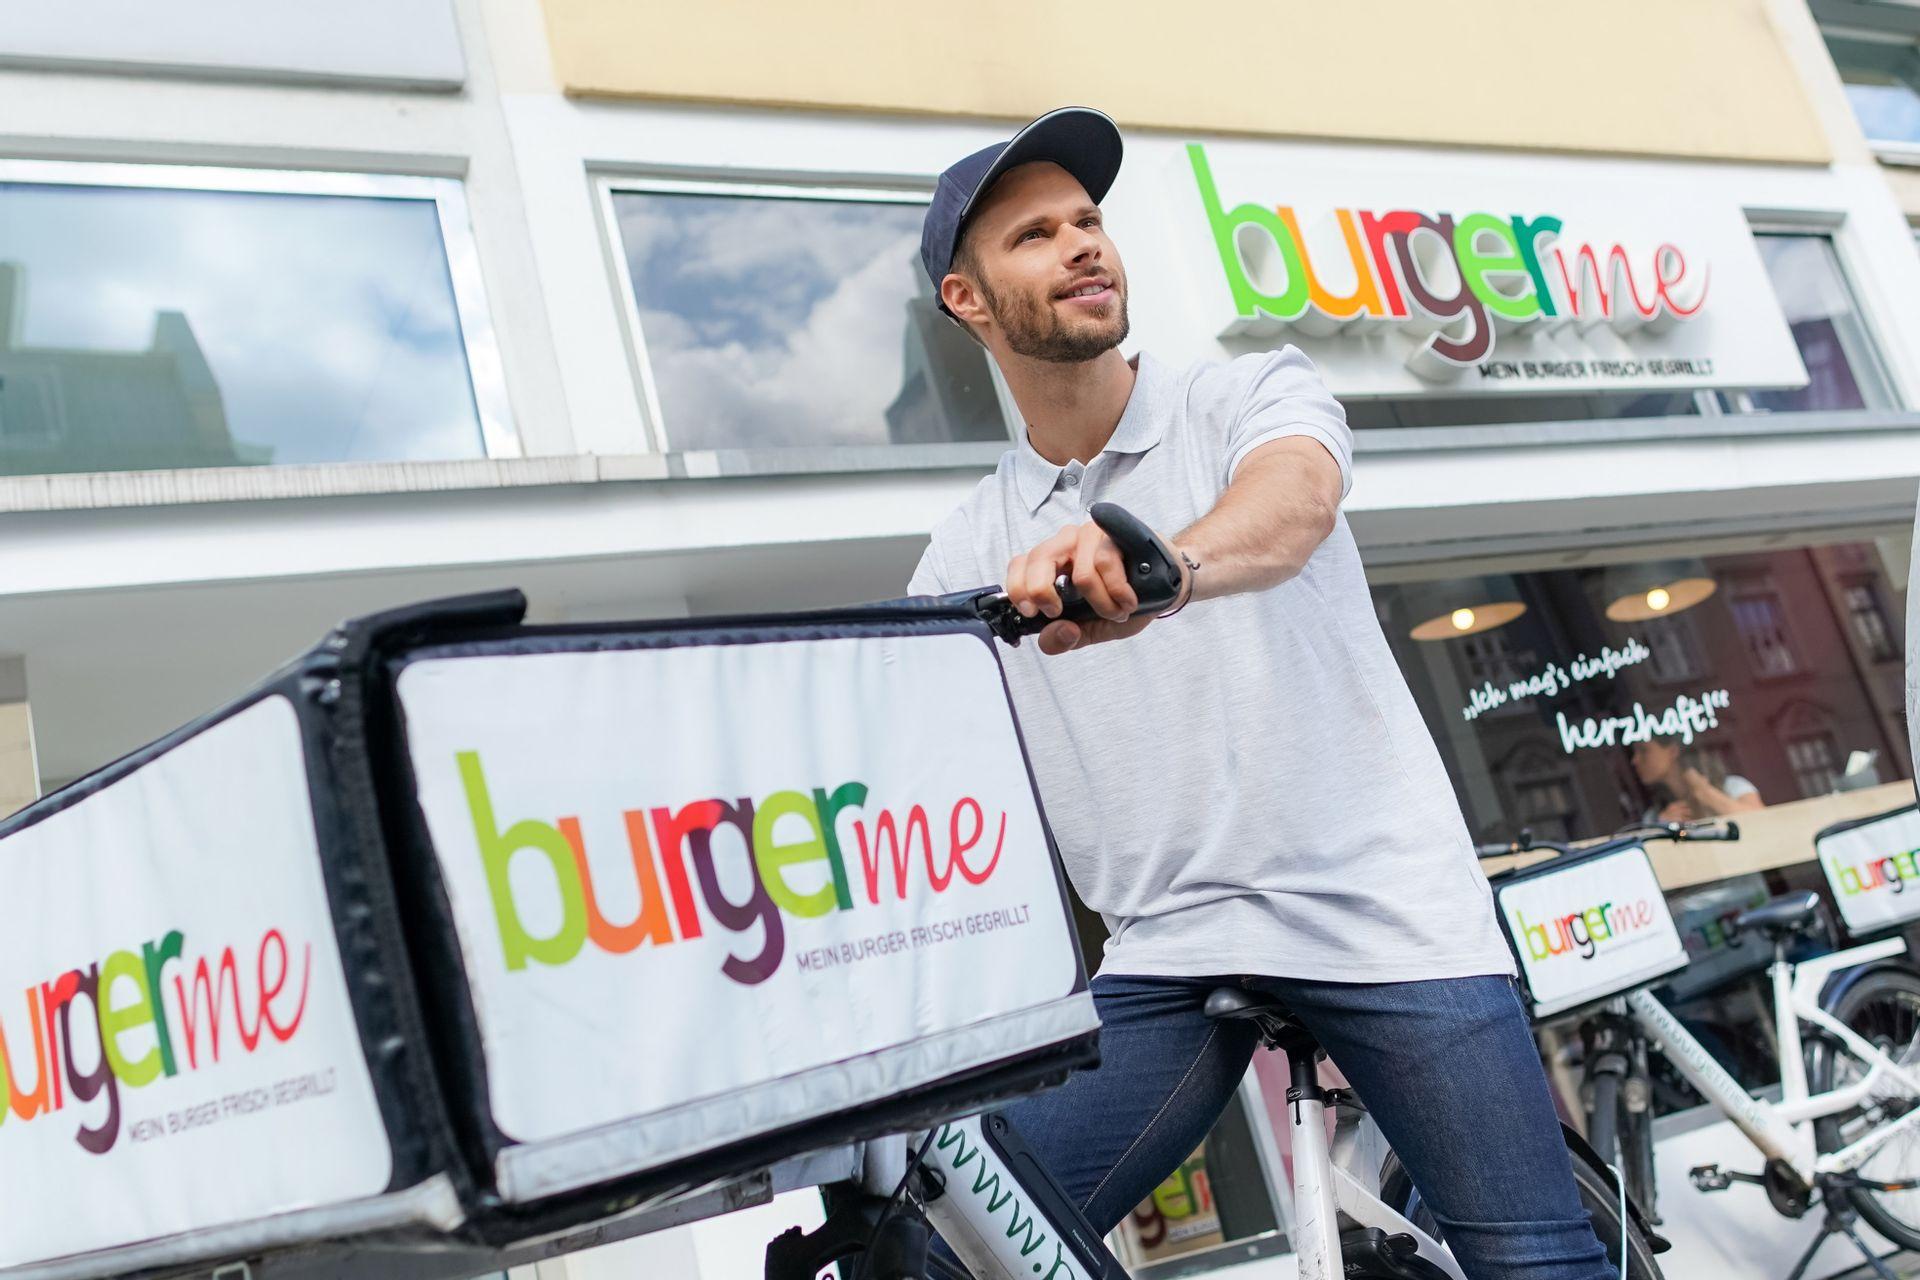 Delivery-Franchise-System Burgerme plant 50 neue Standorte bis Jahresende